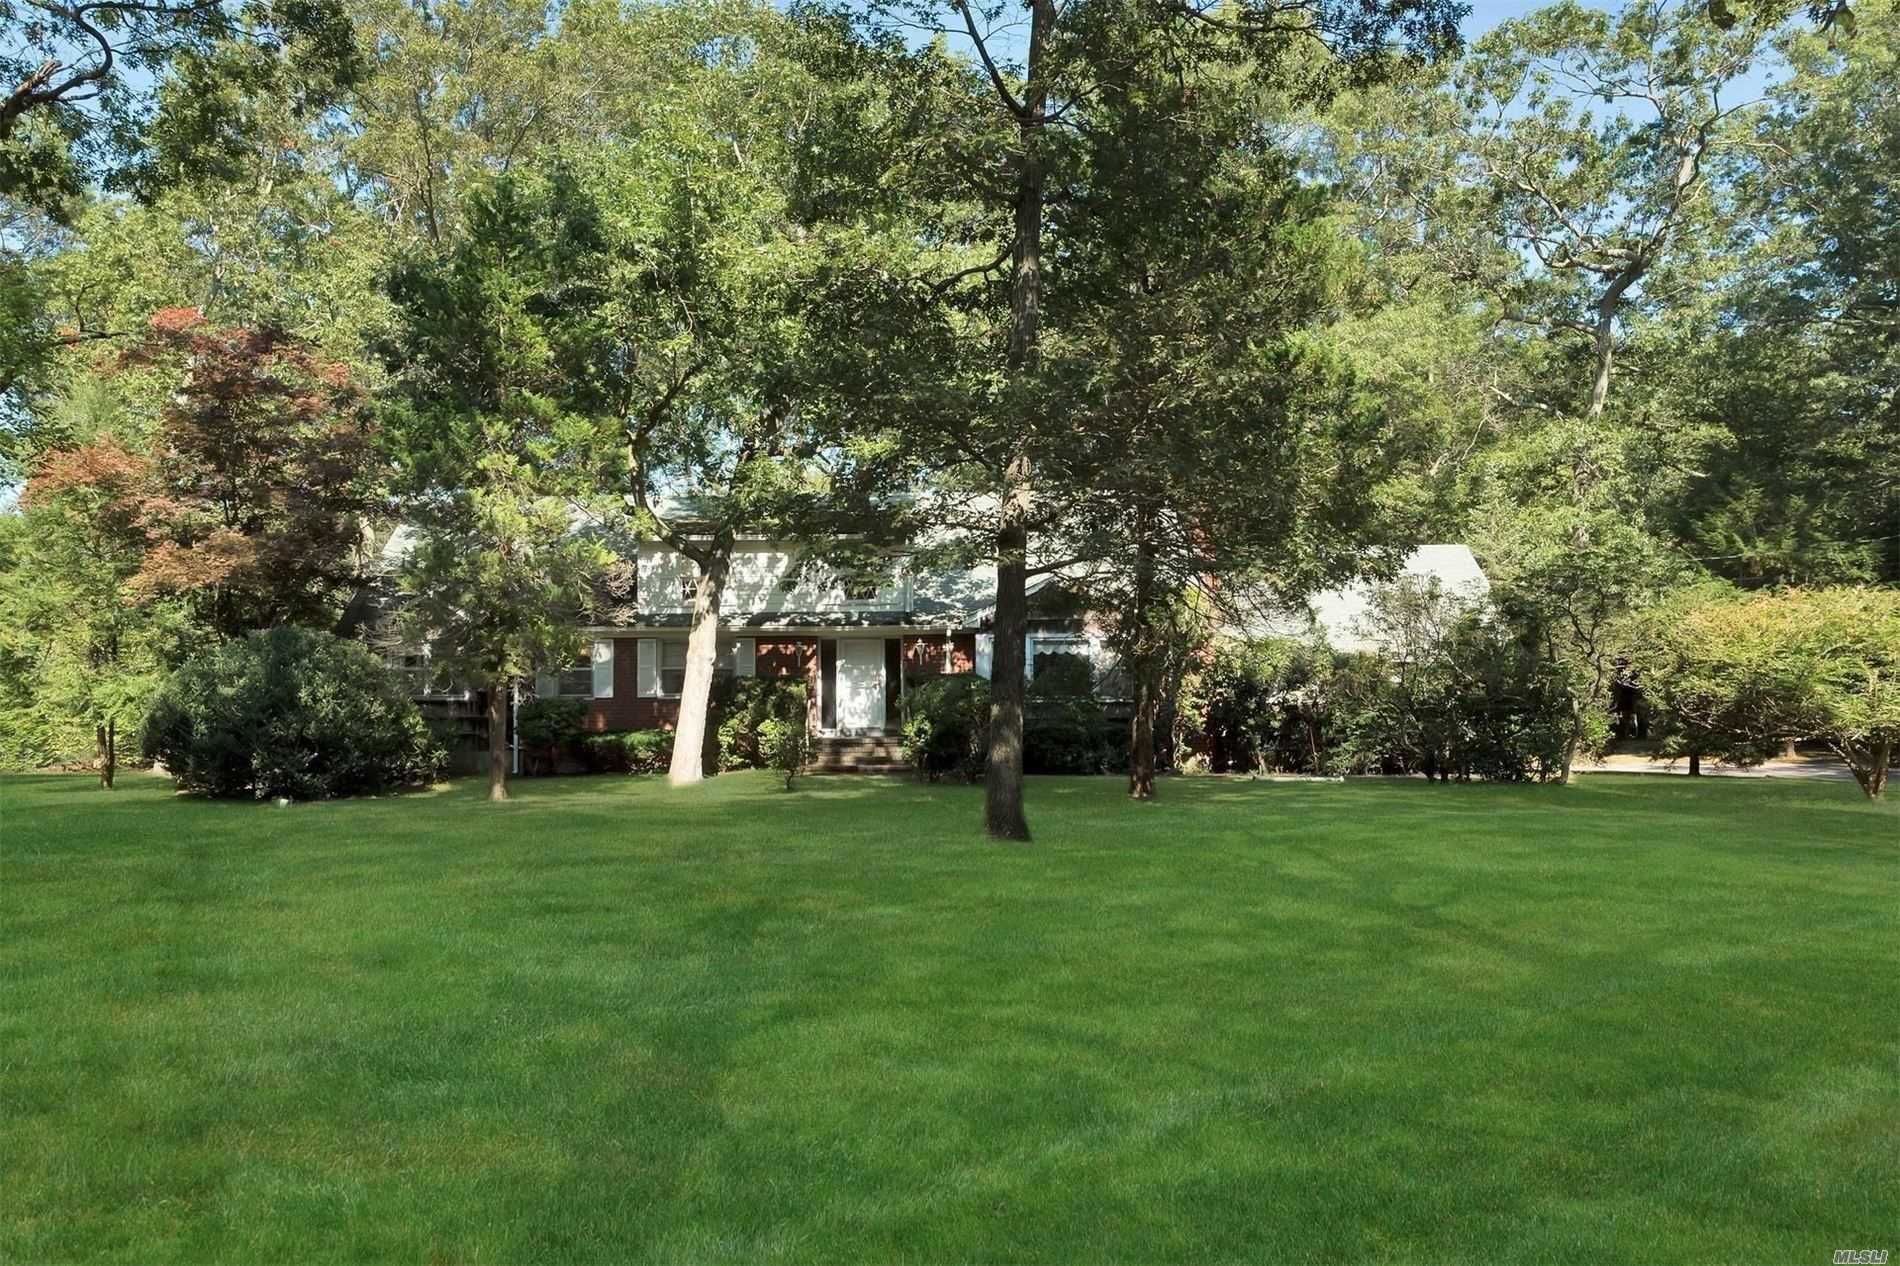 1946 Vincent Lane, Syosset, NY 11791 - MLS#: 3165977